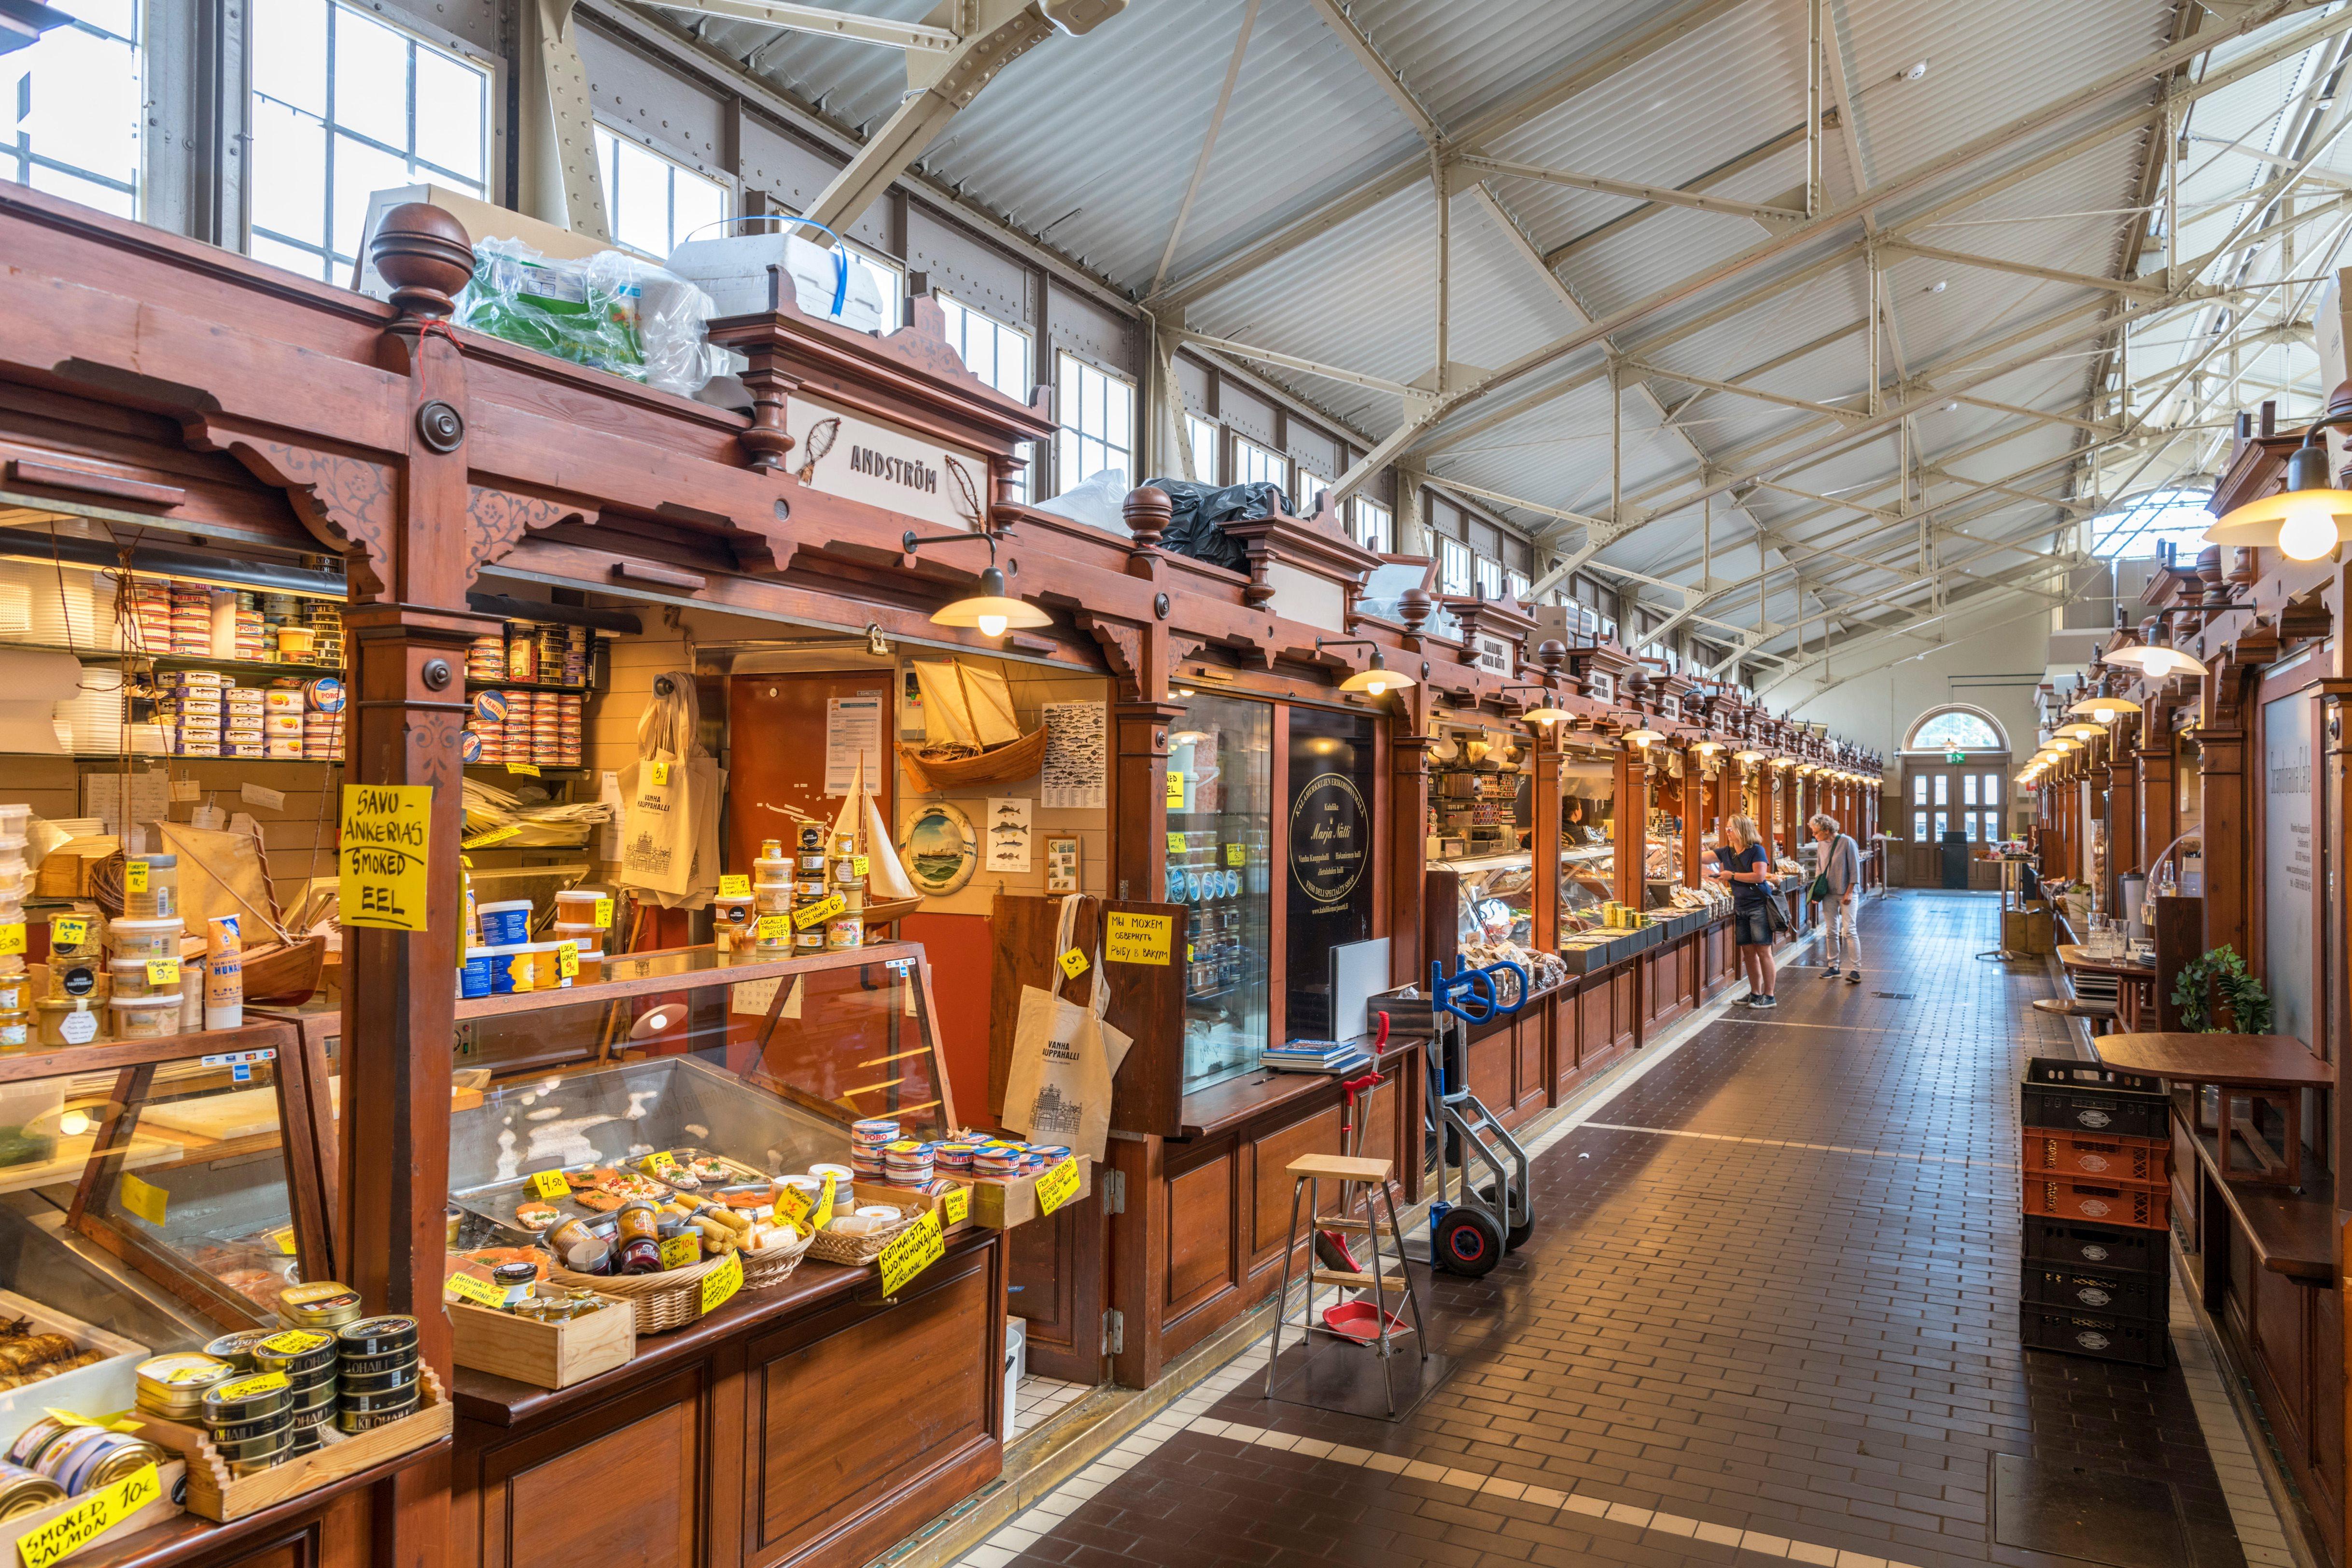 Helsinki Old Market Hall (Vanha Kauppahalli), Helsinki, Finland